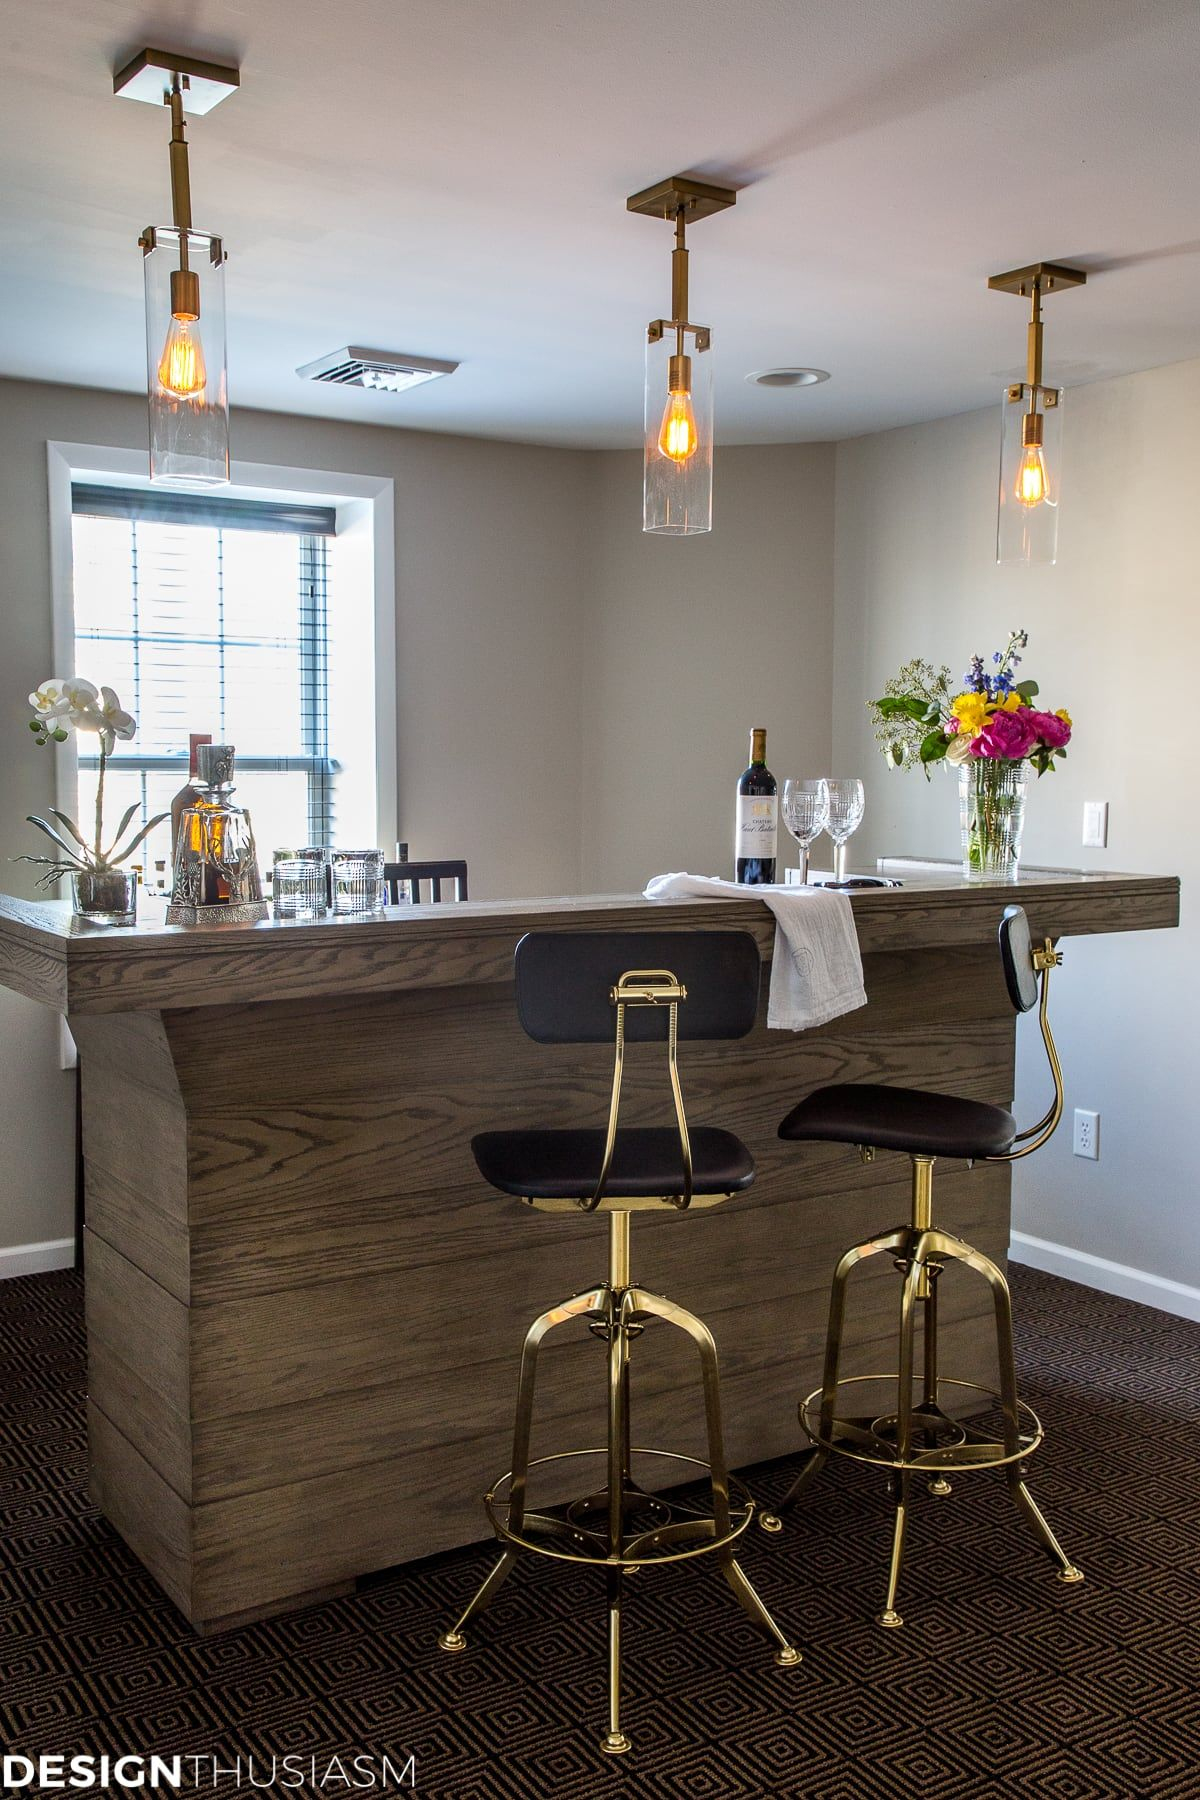 Home Bar Ideas: 6 Steps to an Elegant Basement Bar (With ...